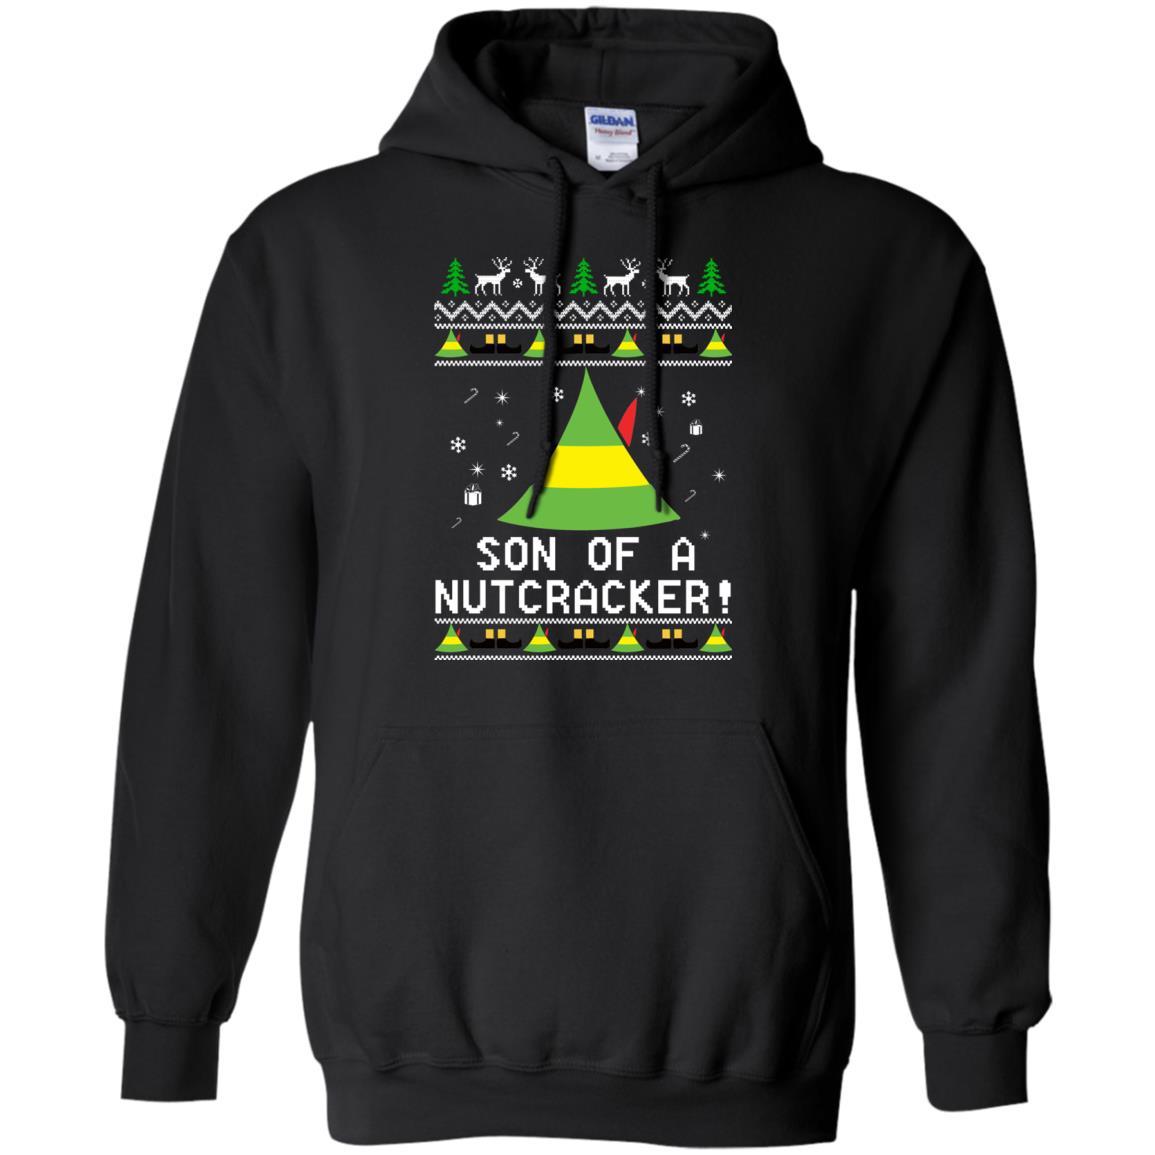 image 1979 - Son of a Nutcracker Elf Christmas Sweatshirt, Ugly Sweater